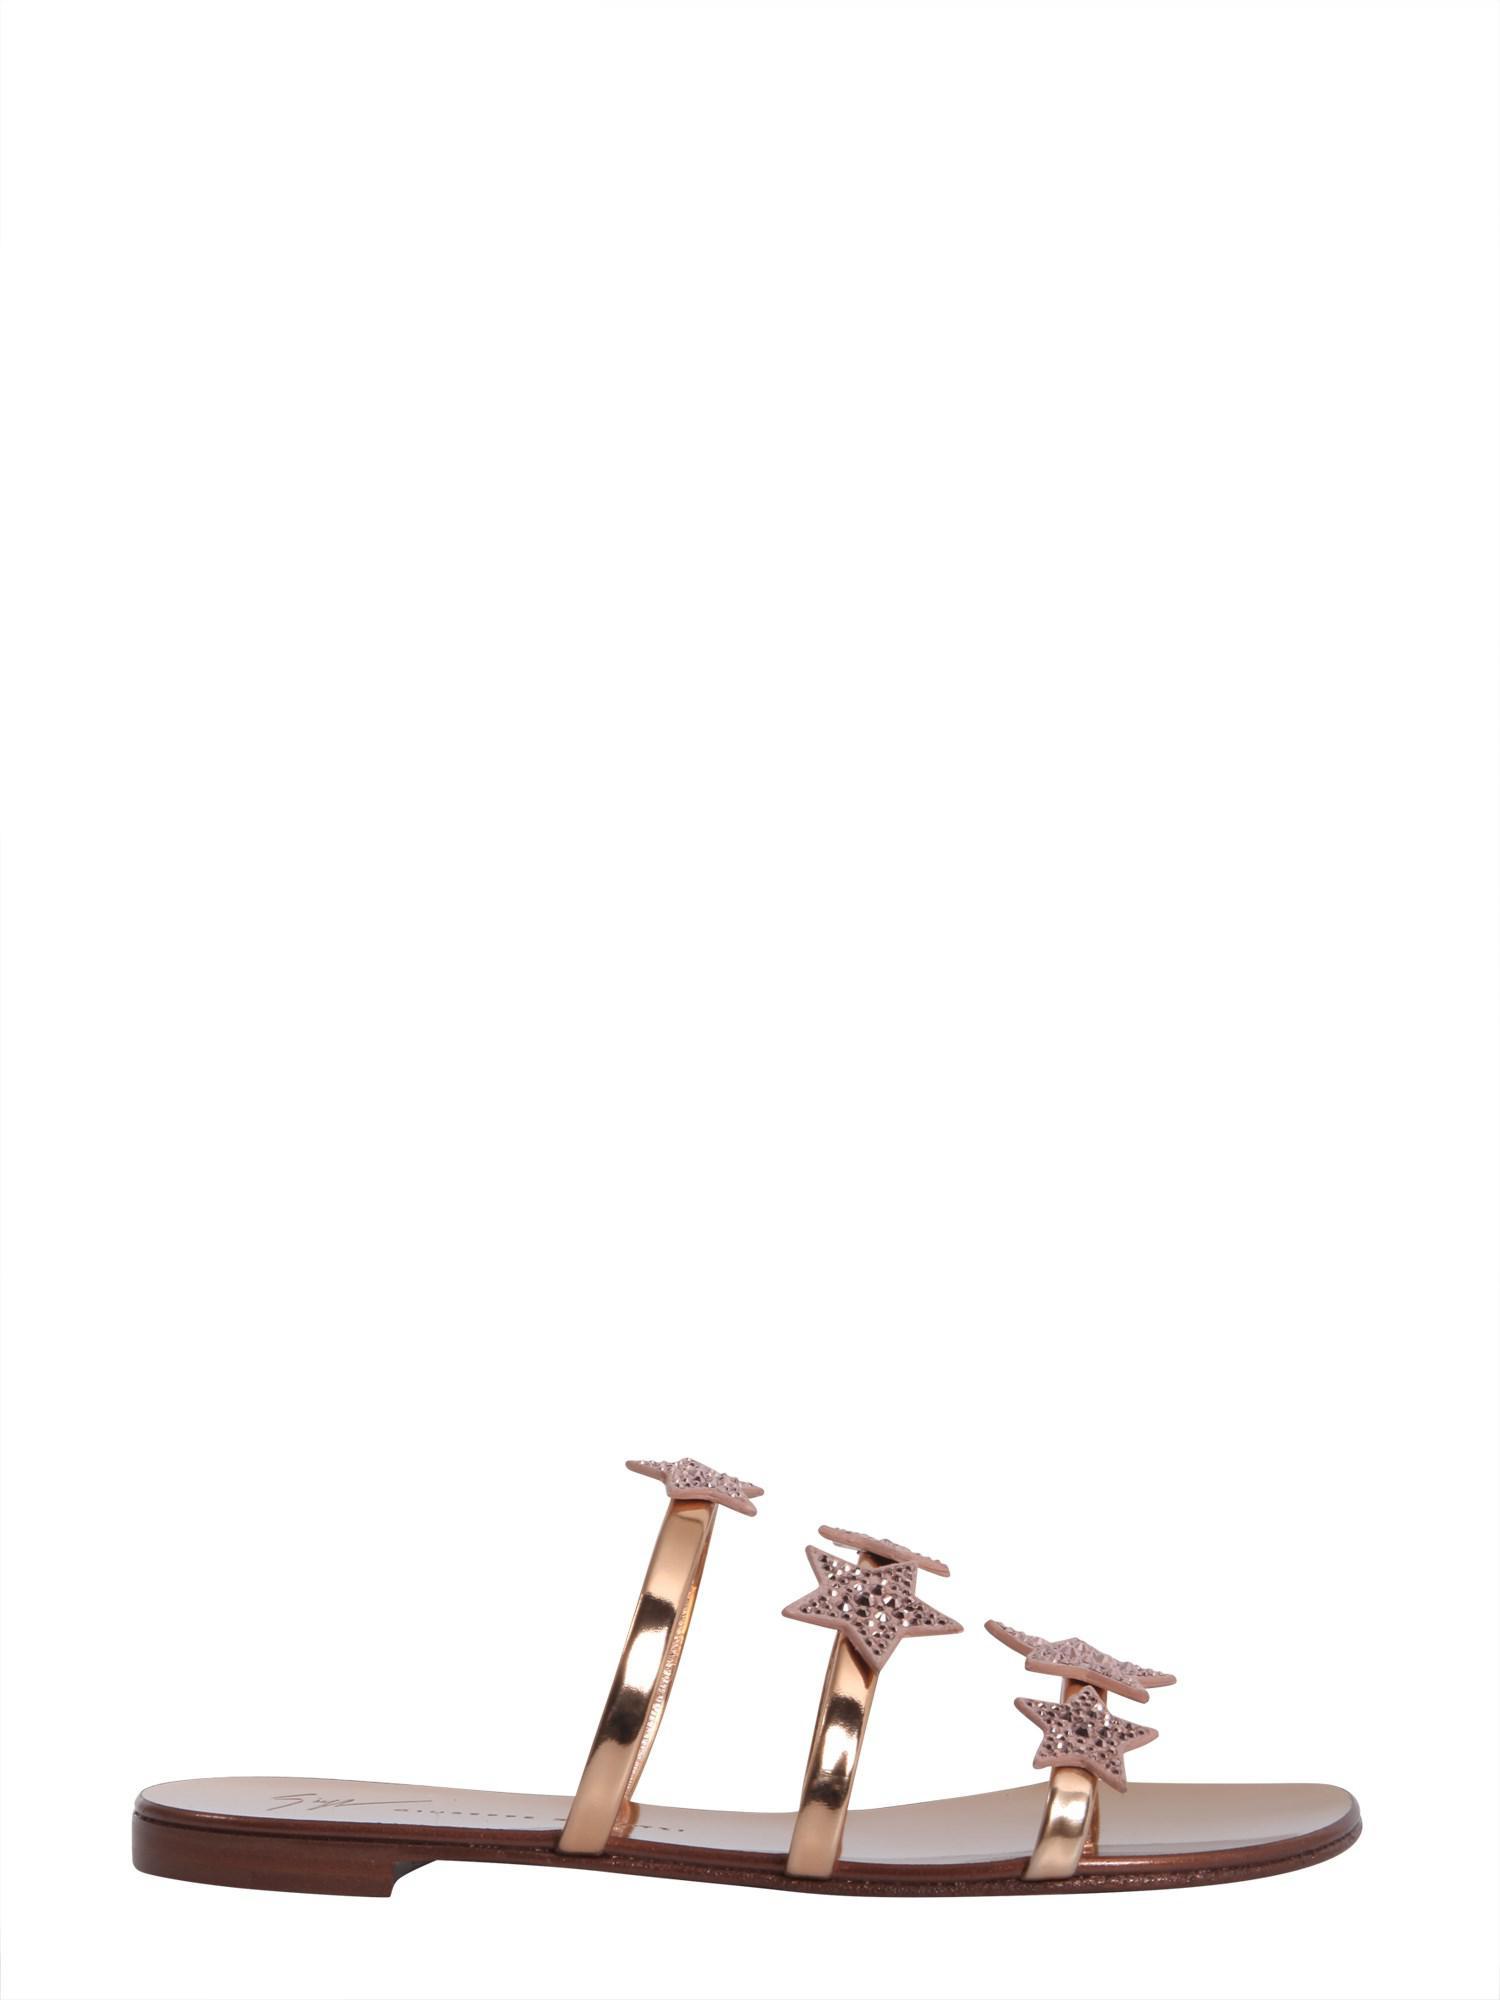 Giuseppe Zanotti Mirrored patent flat sandal with three straps and stars ANYA STAR fYvcV9